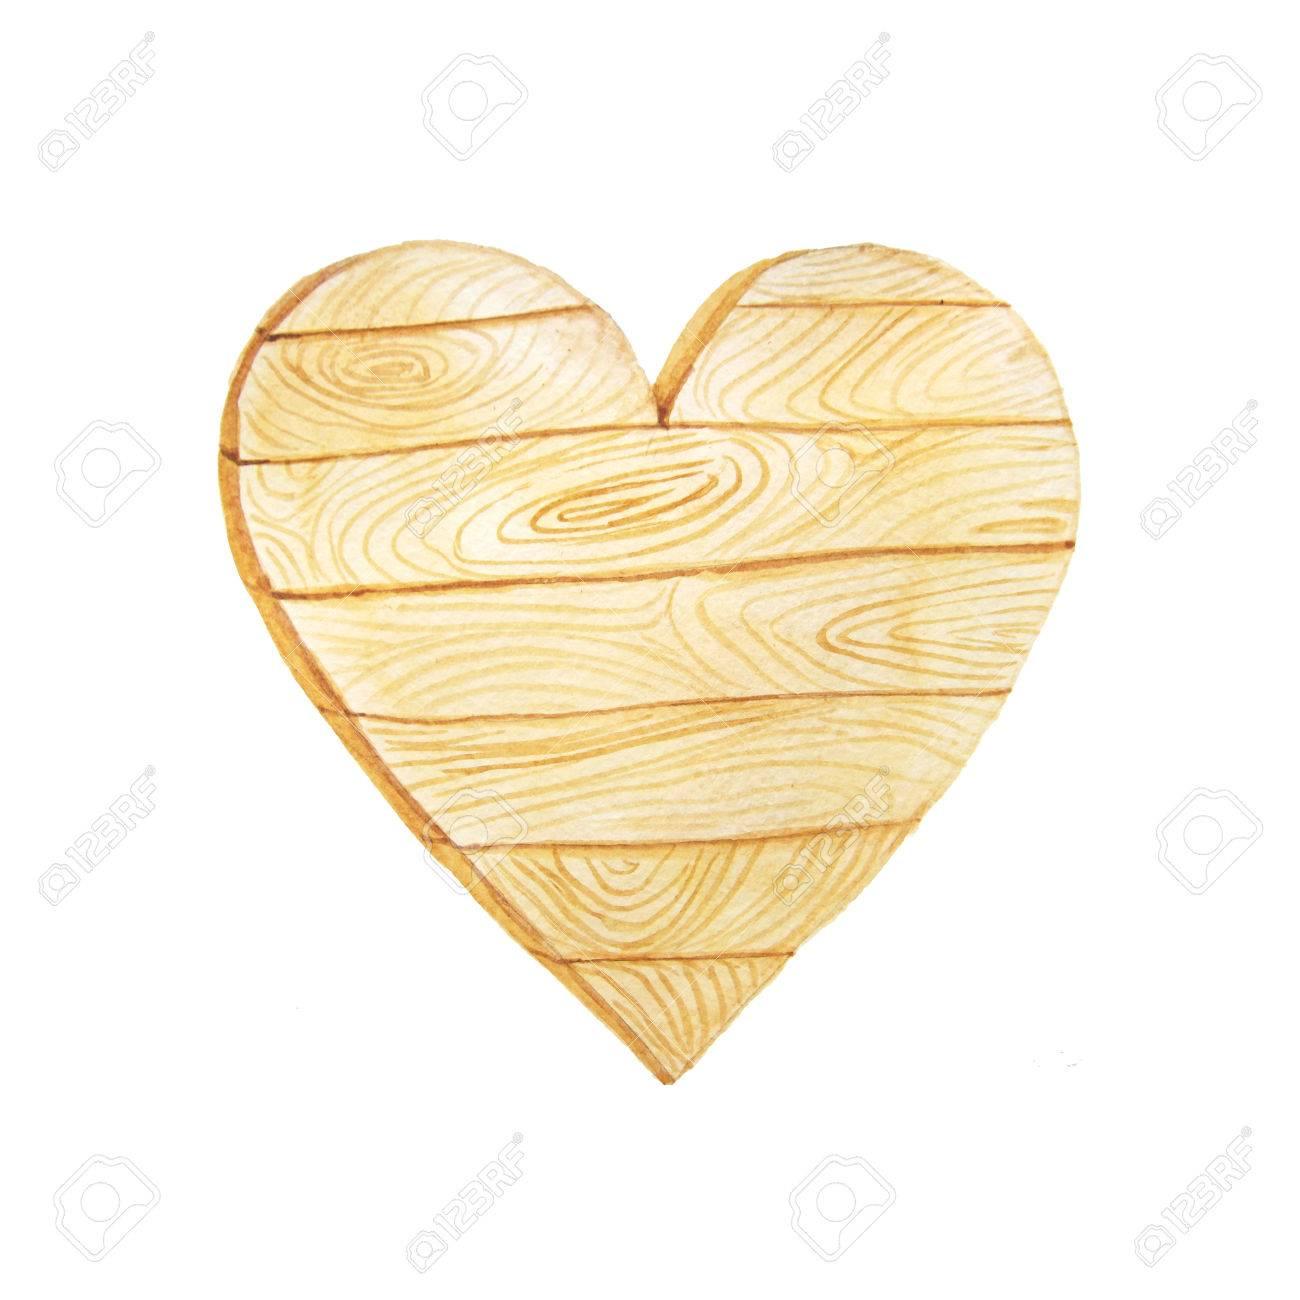 Hand Bemalt Aquarell Holz Herz Im Rustikalen Stil Dekorative Holz